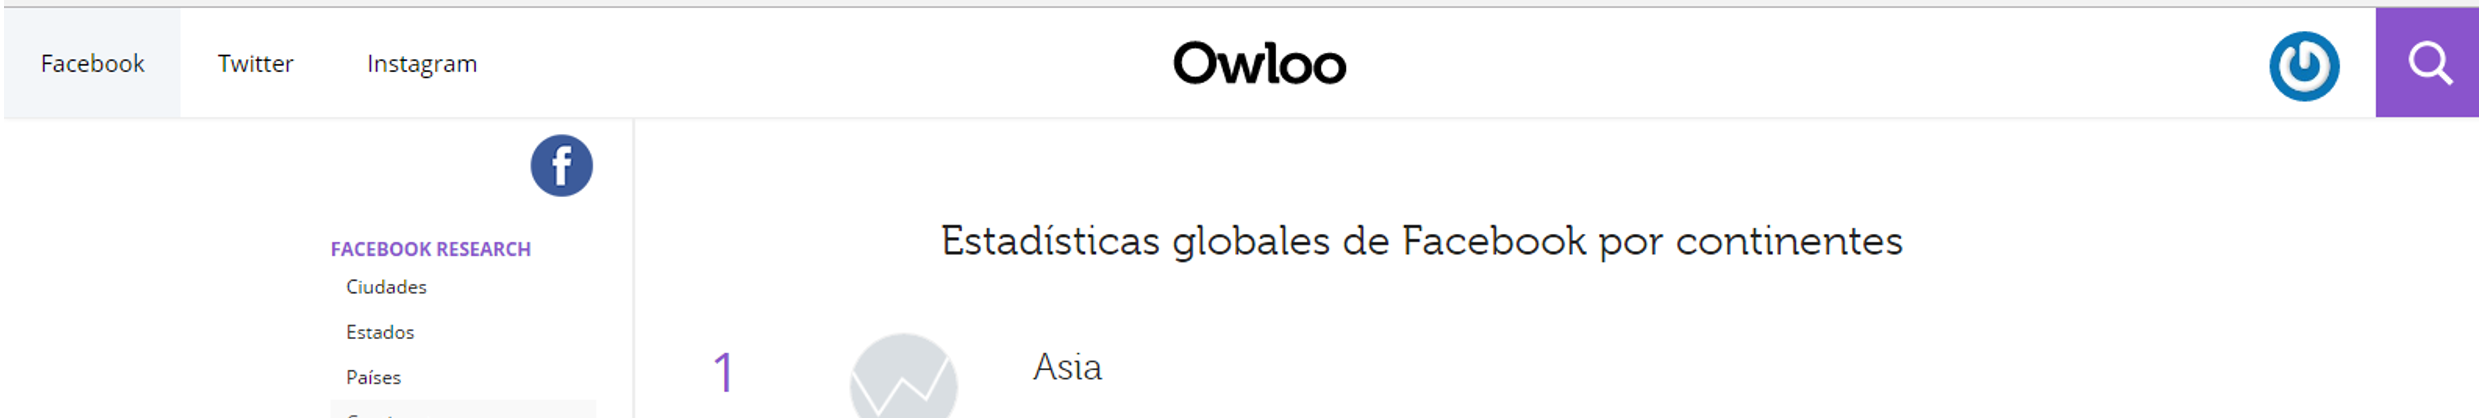 estadísticas globales Owloo_1.png